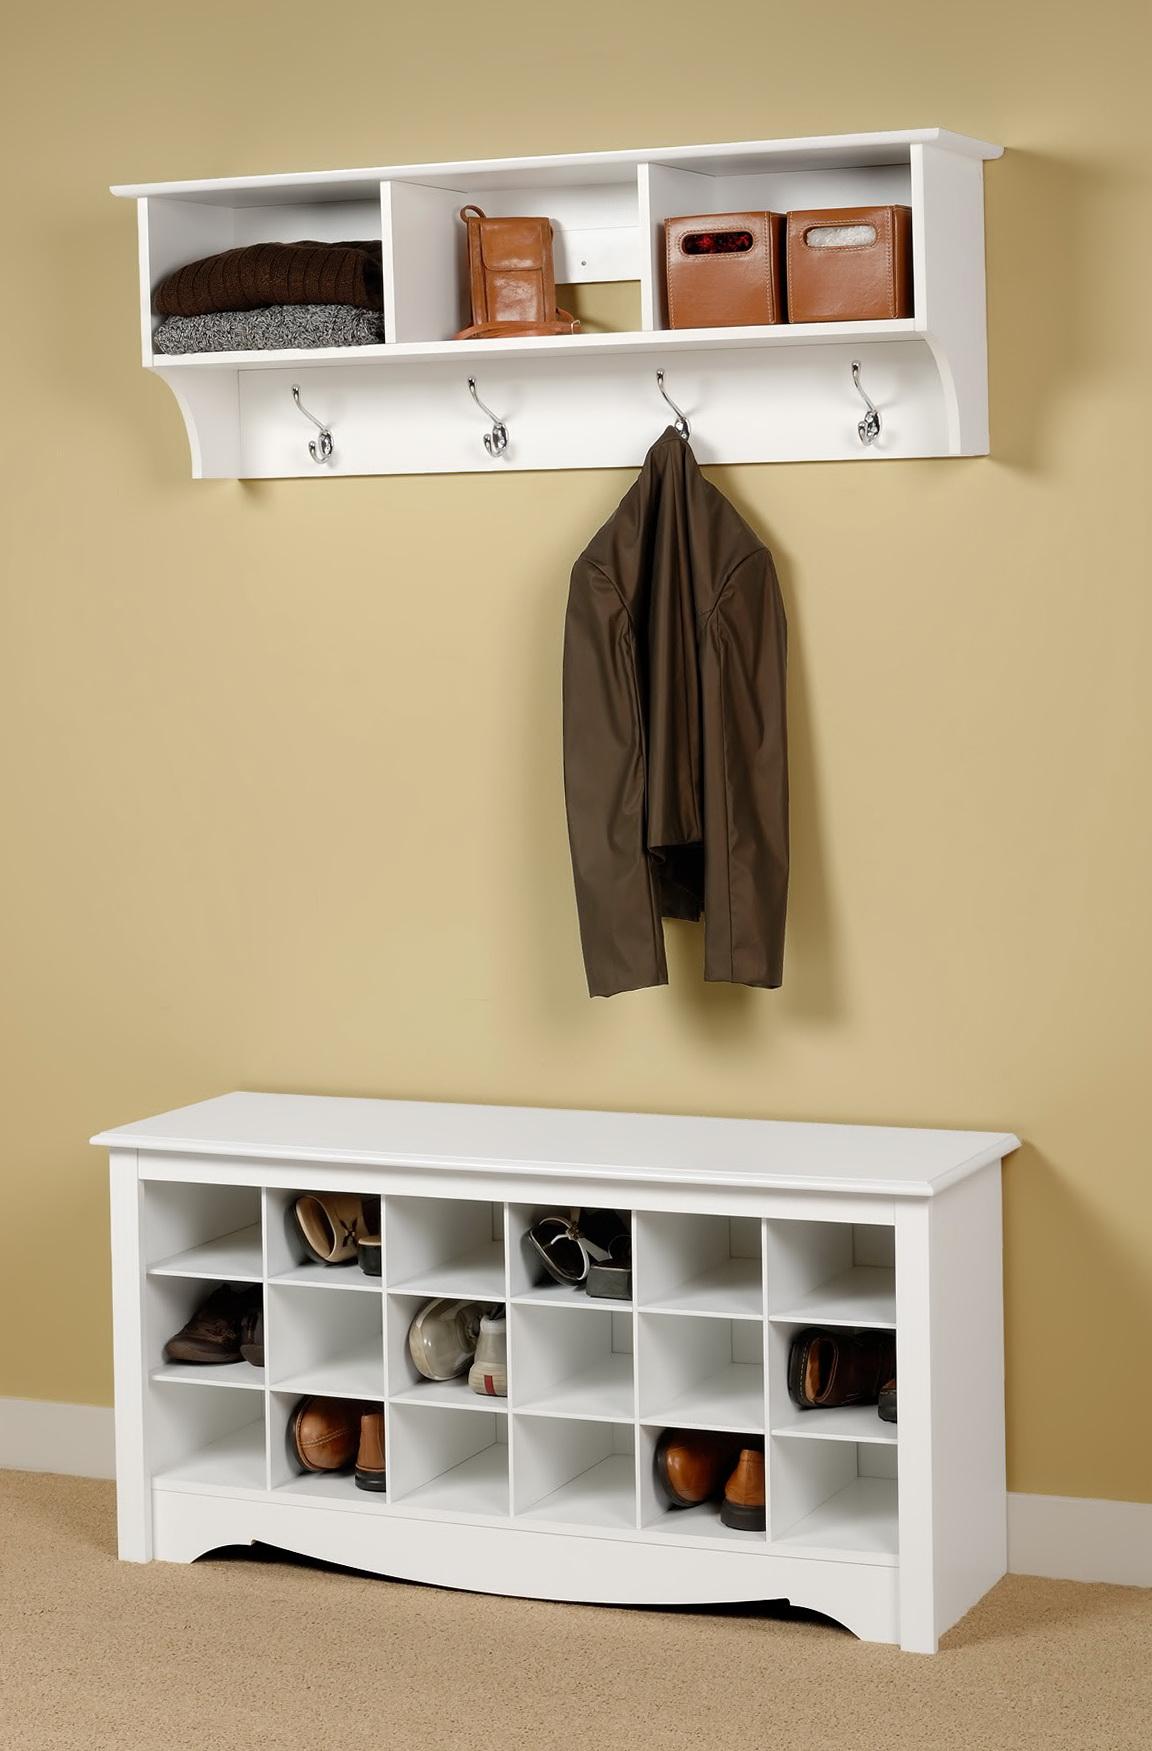 Ikea Shoe Rack Bench